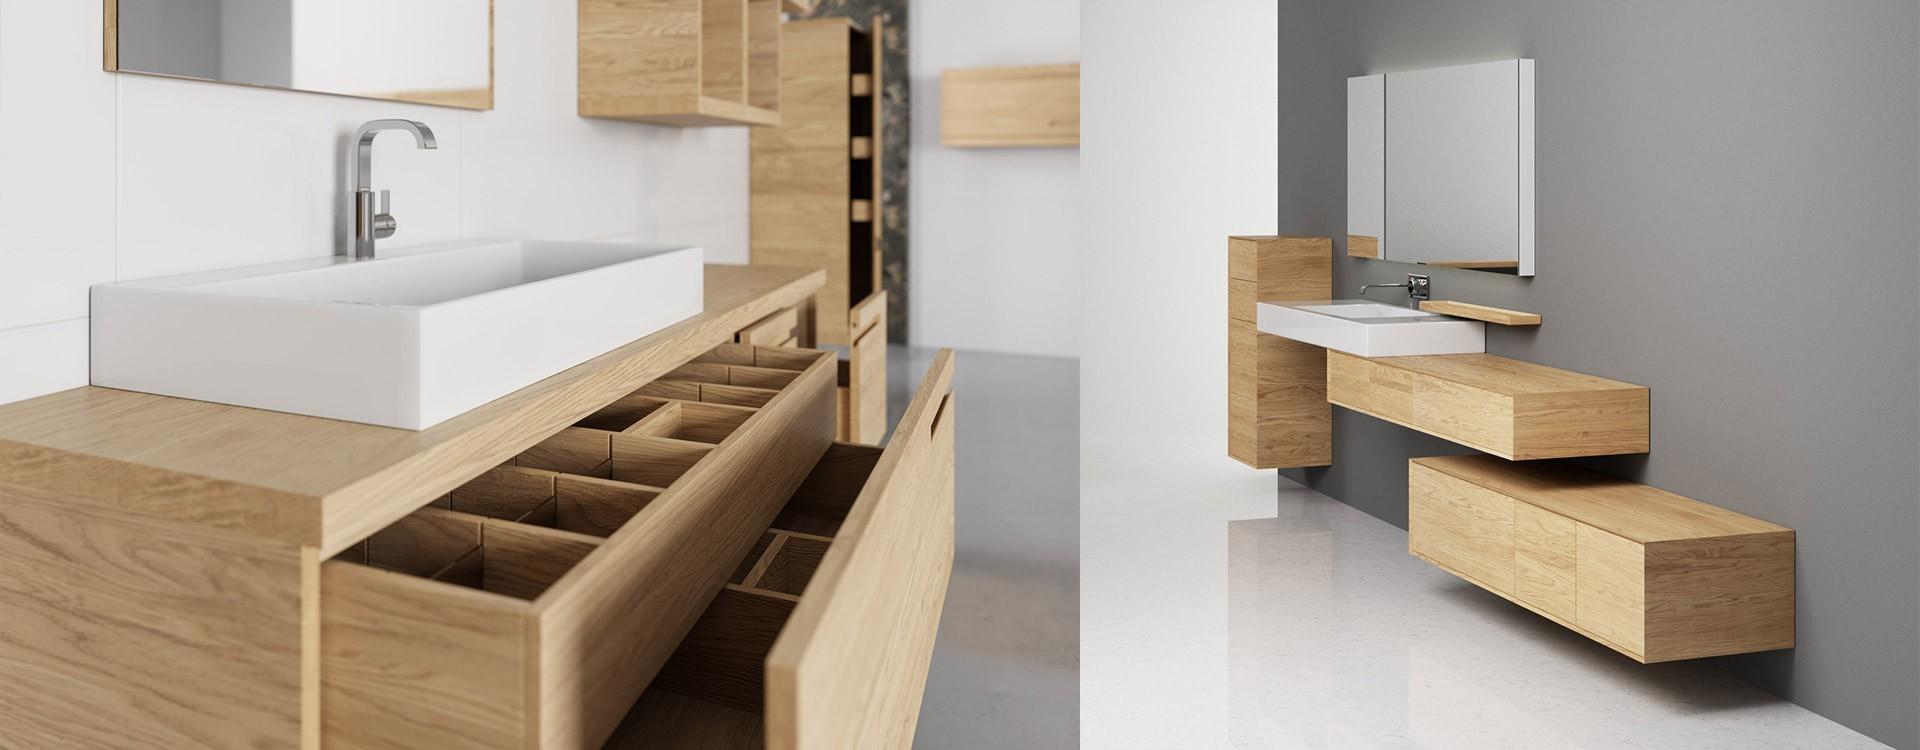 Designer Bathroom Furniture With Solid Wood, Real Wood Bathroom Furniture